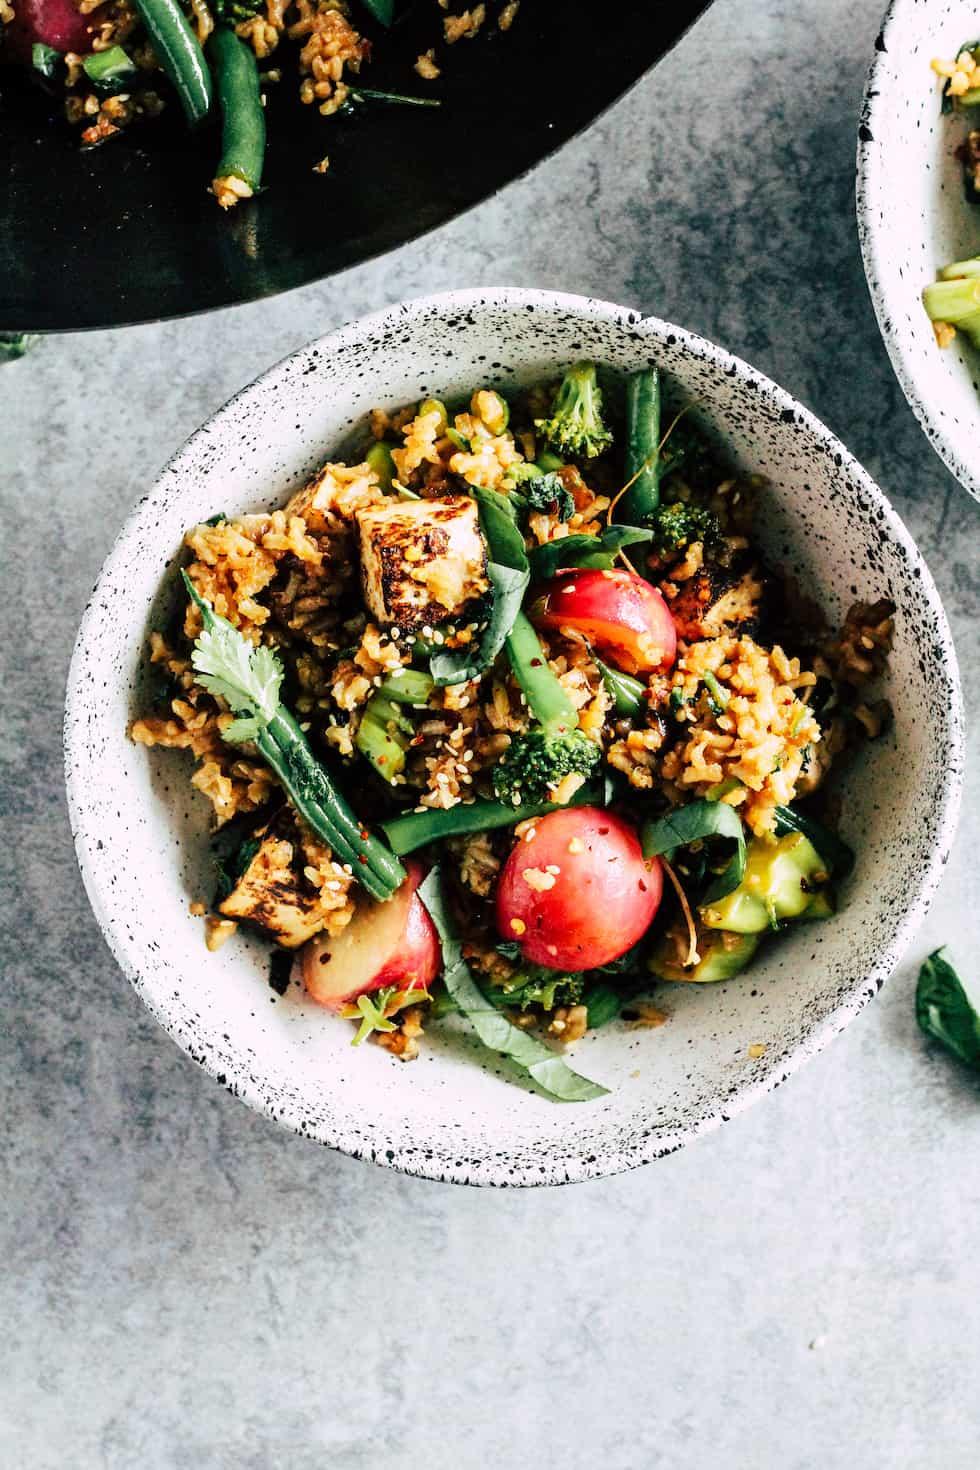 Overhead image of veggie fried rice in white ceramic bowl.